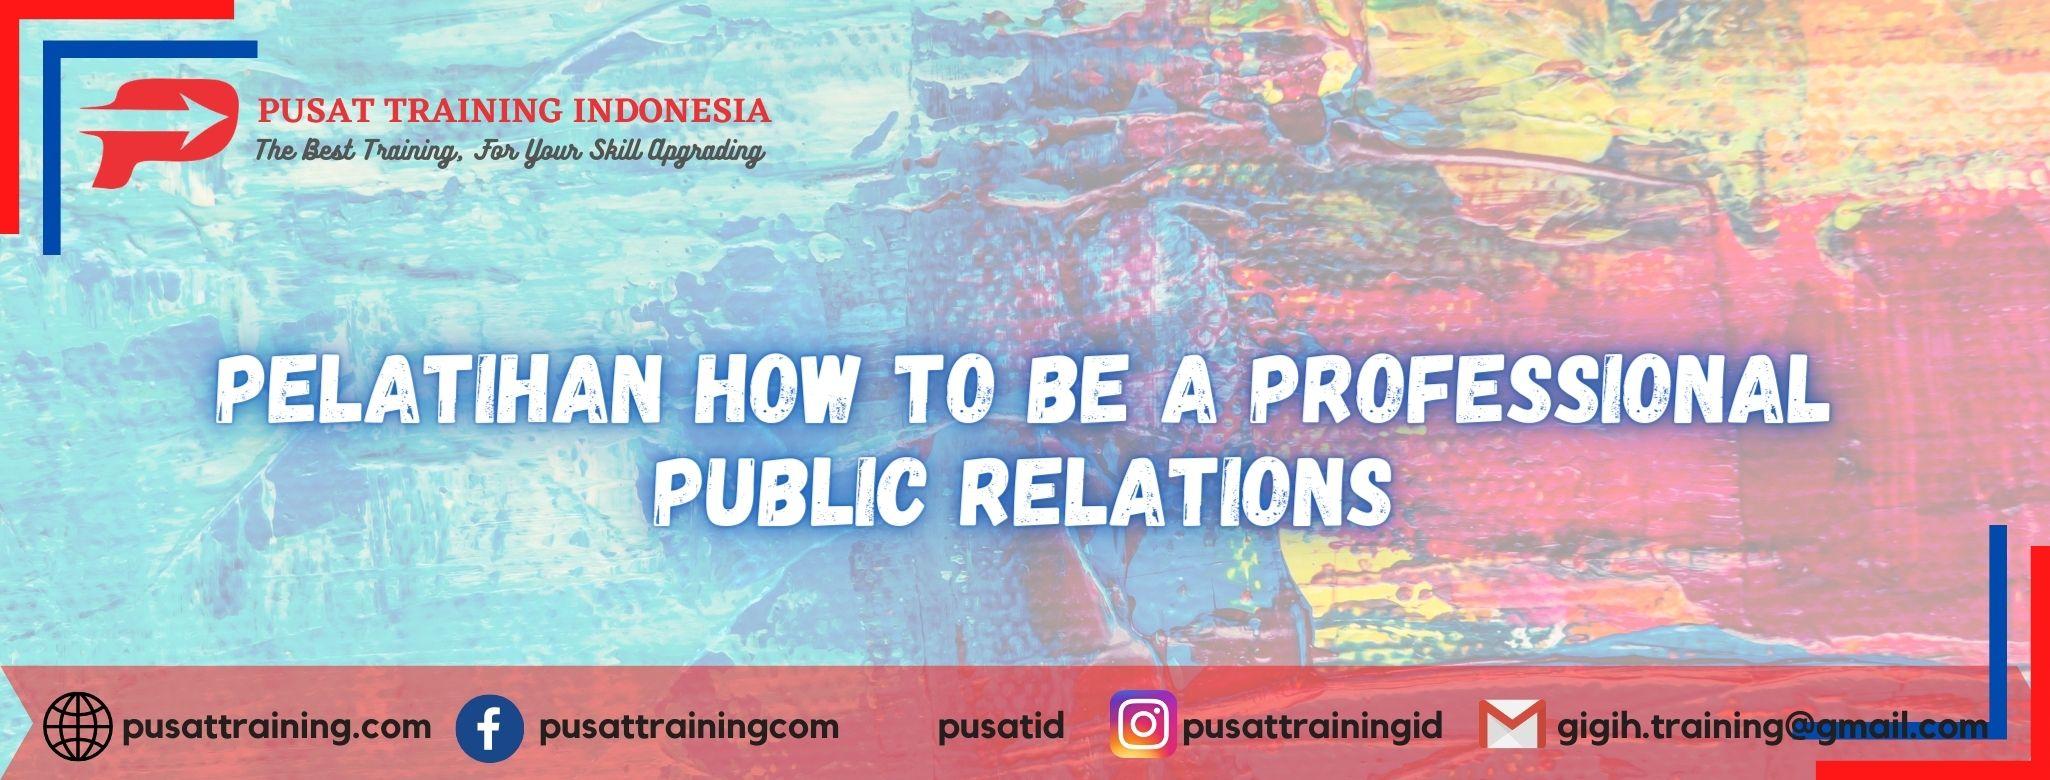 Pelatihan-How-to-be-a-Professional-Public-Relations